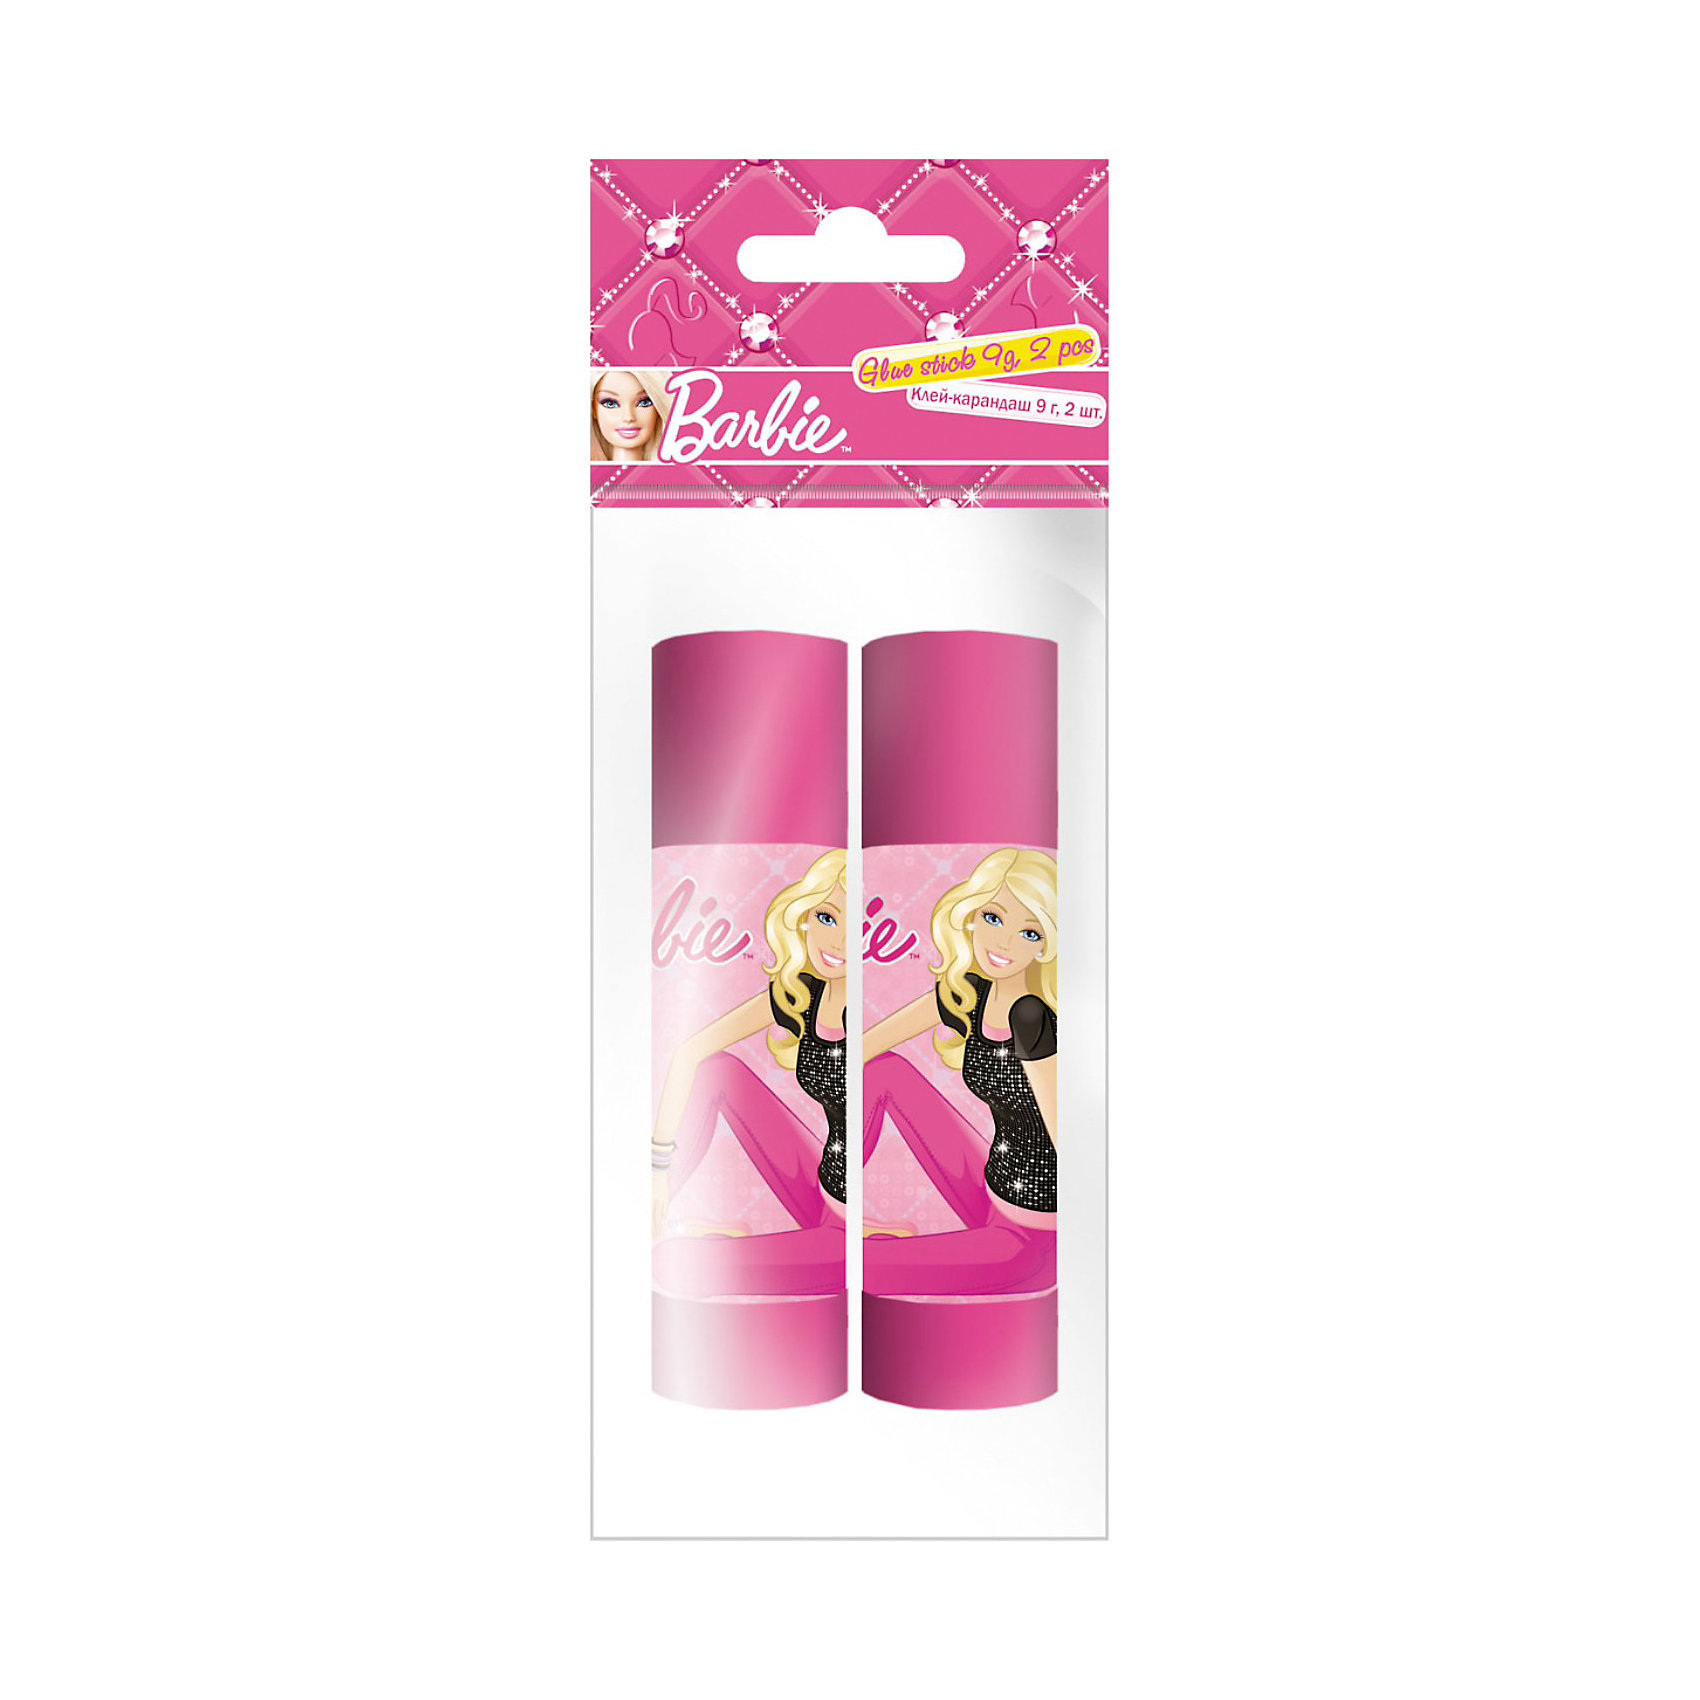 Академия групп Клей-карандаши, 9 г, 2 шт, Barbie щетка туннельная dewal 2 х сторонняя пластиковый штифт 9 рядов 1108215